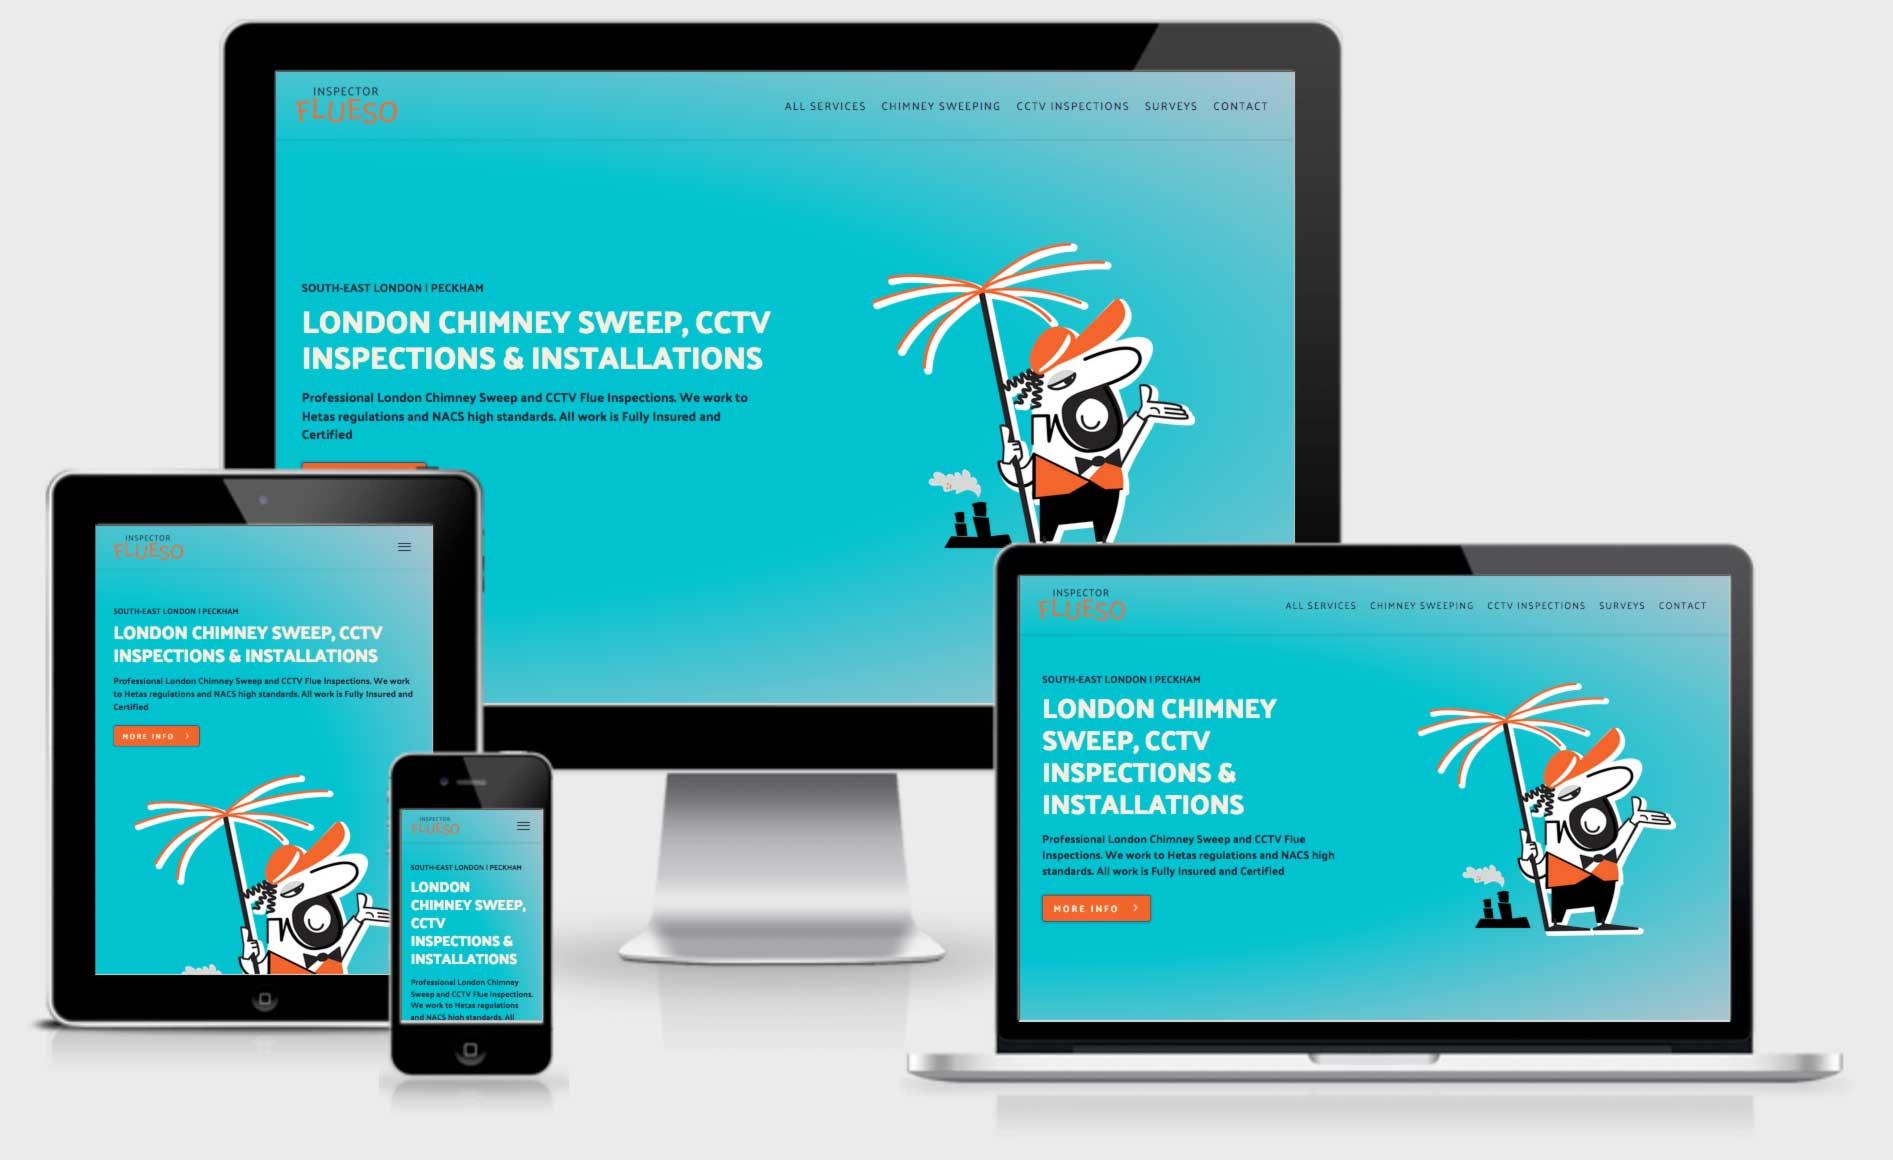 inspector-flueso-mpower-webdesign-template